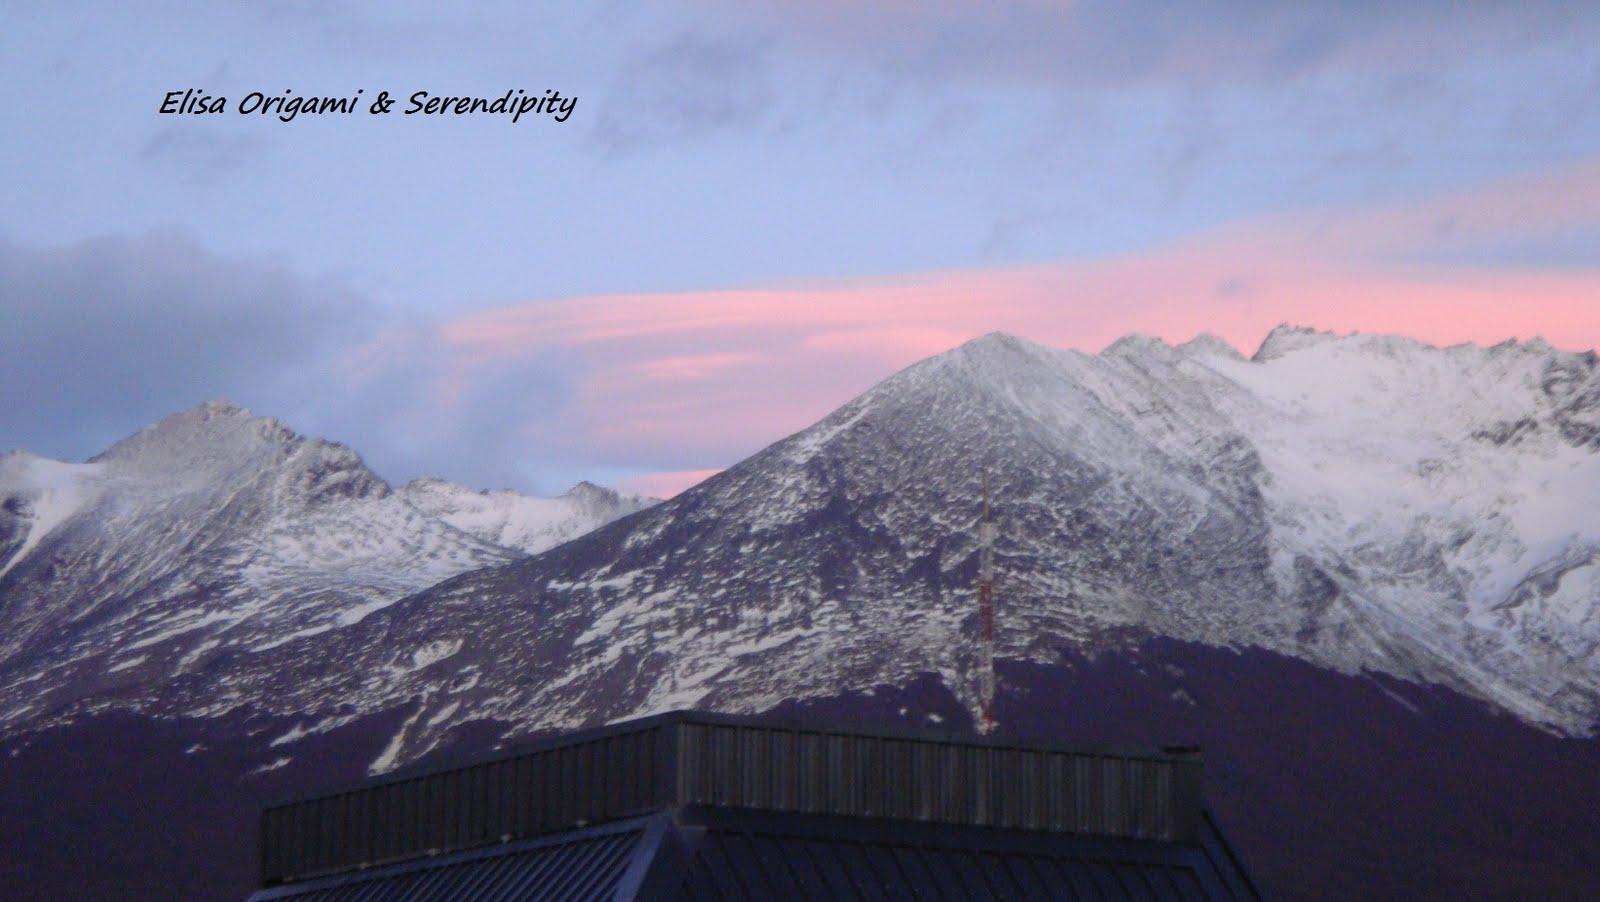 El sol en Ushuaia, Argentina, Blog de Elisa N Diseño de Viajes